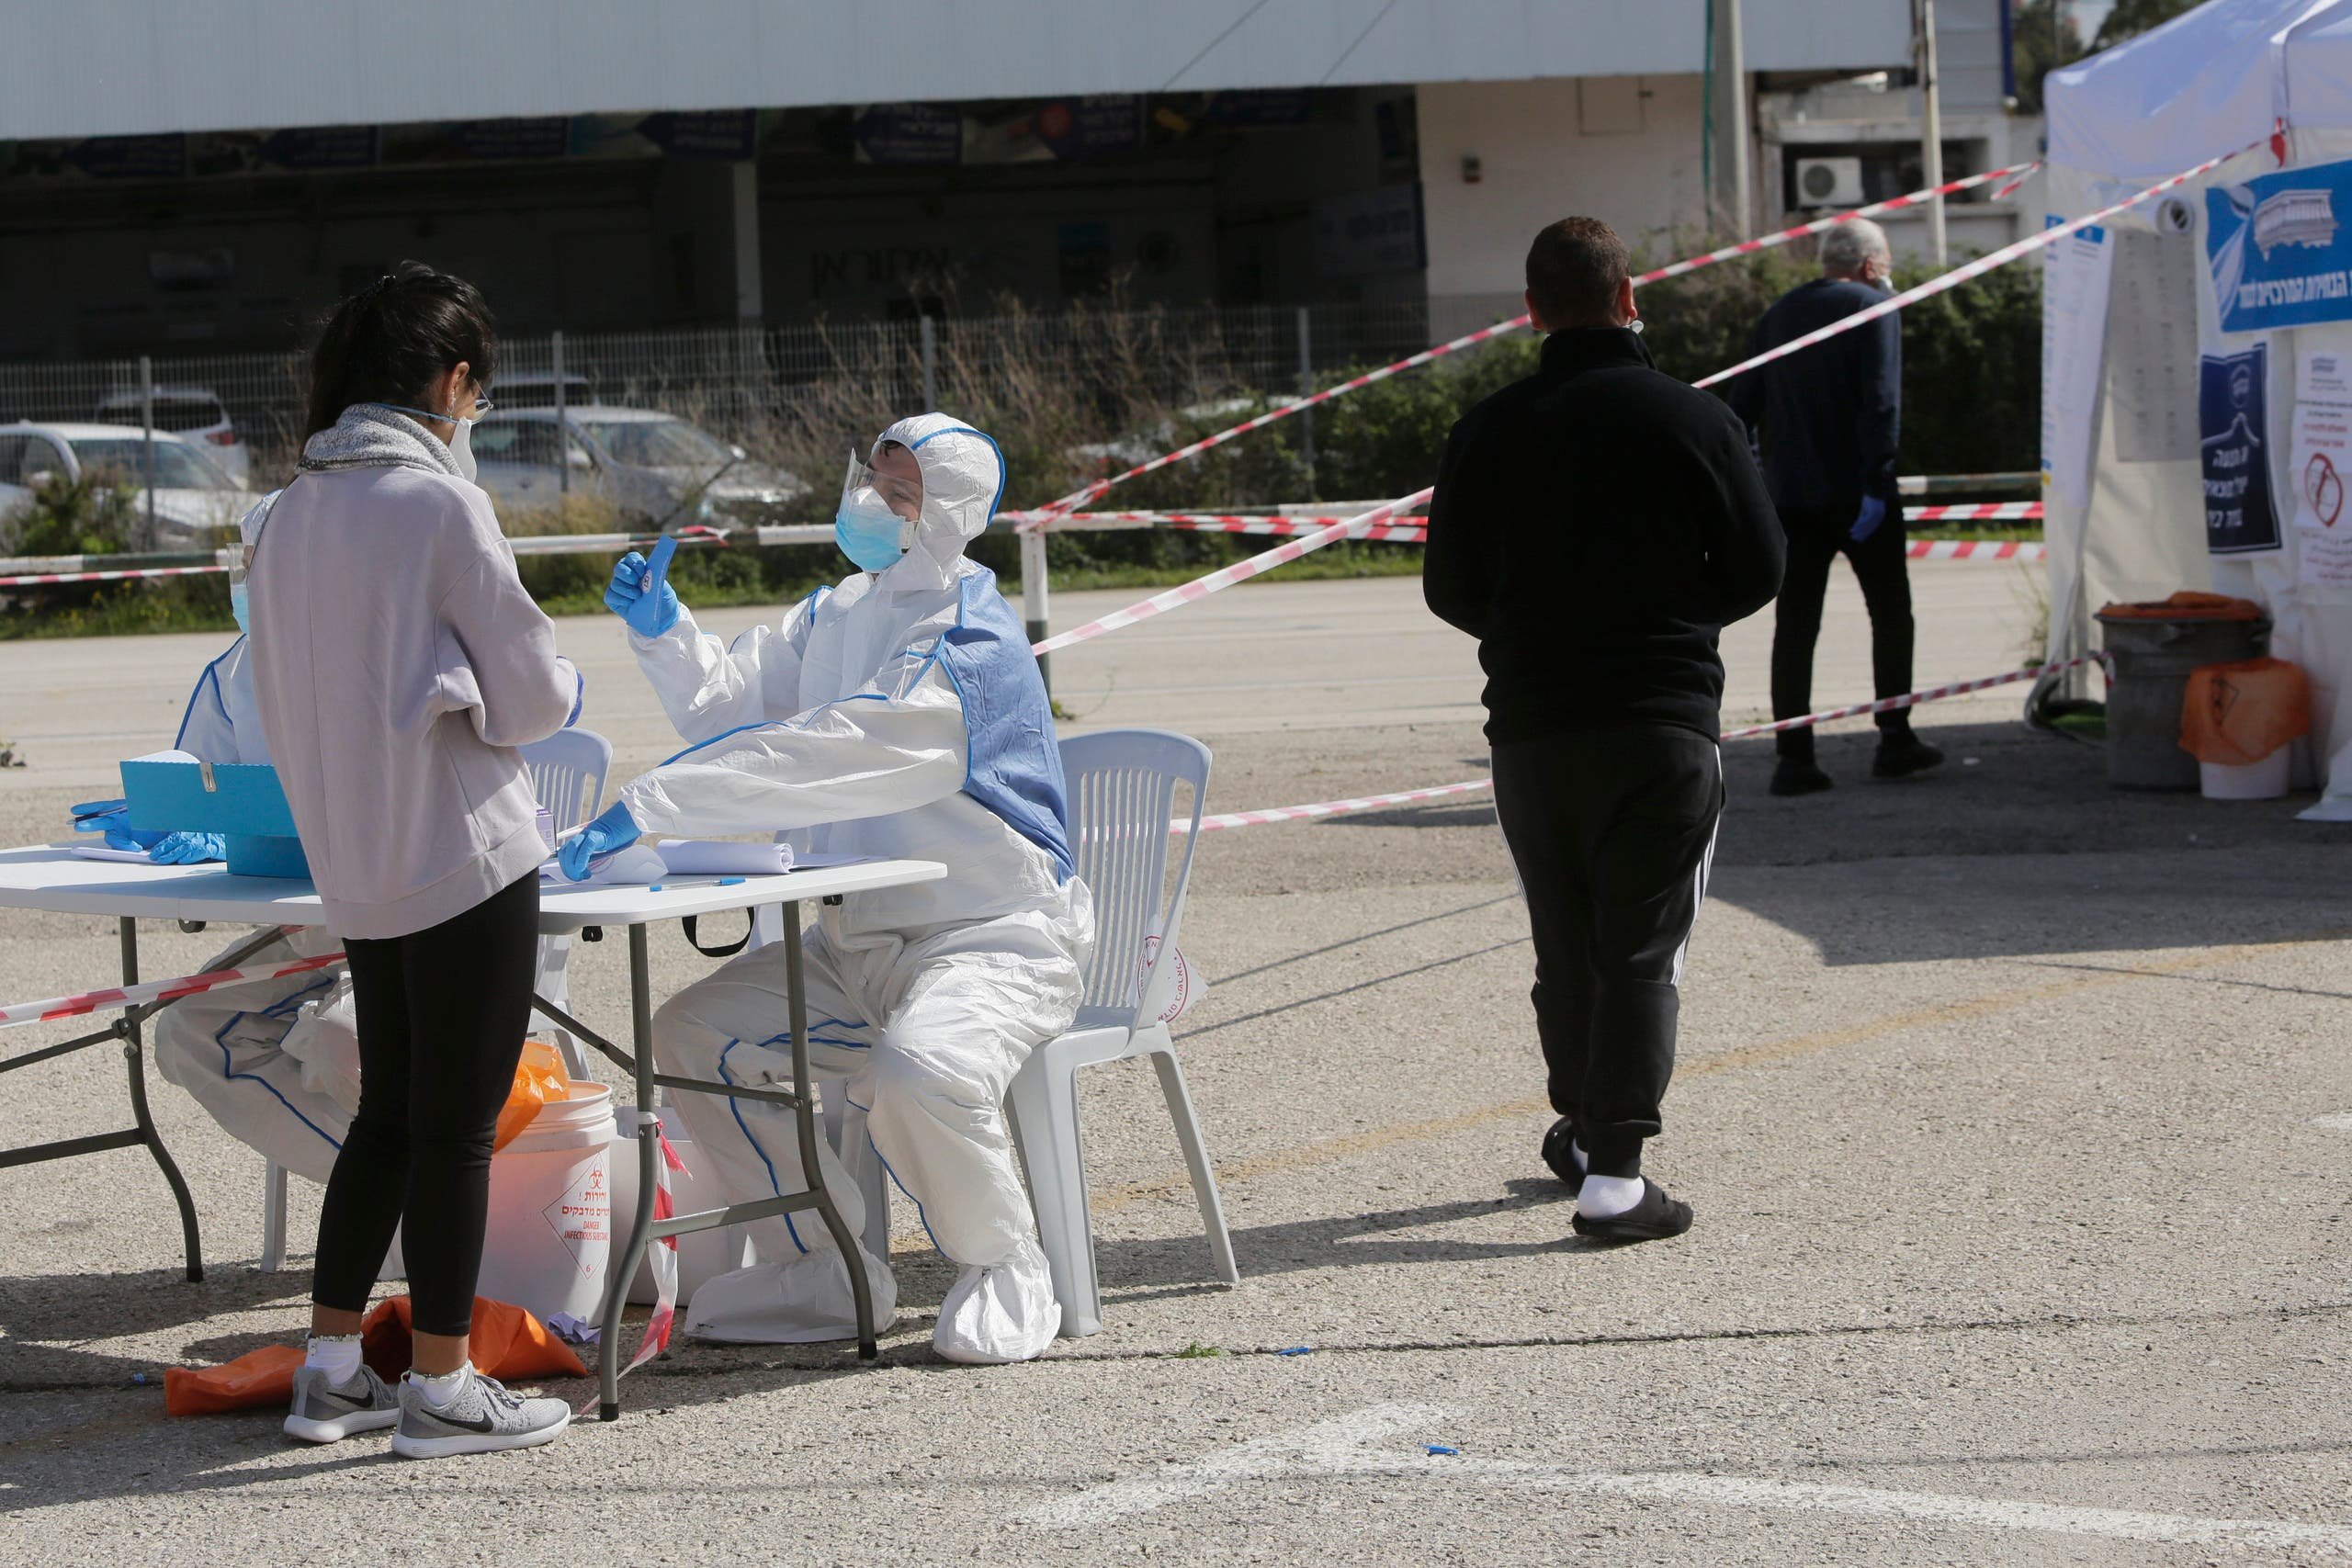 People quarantined with Corona virus arrive to vote in Haifa, Israel, March 2, 2020 (AP)